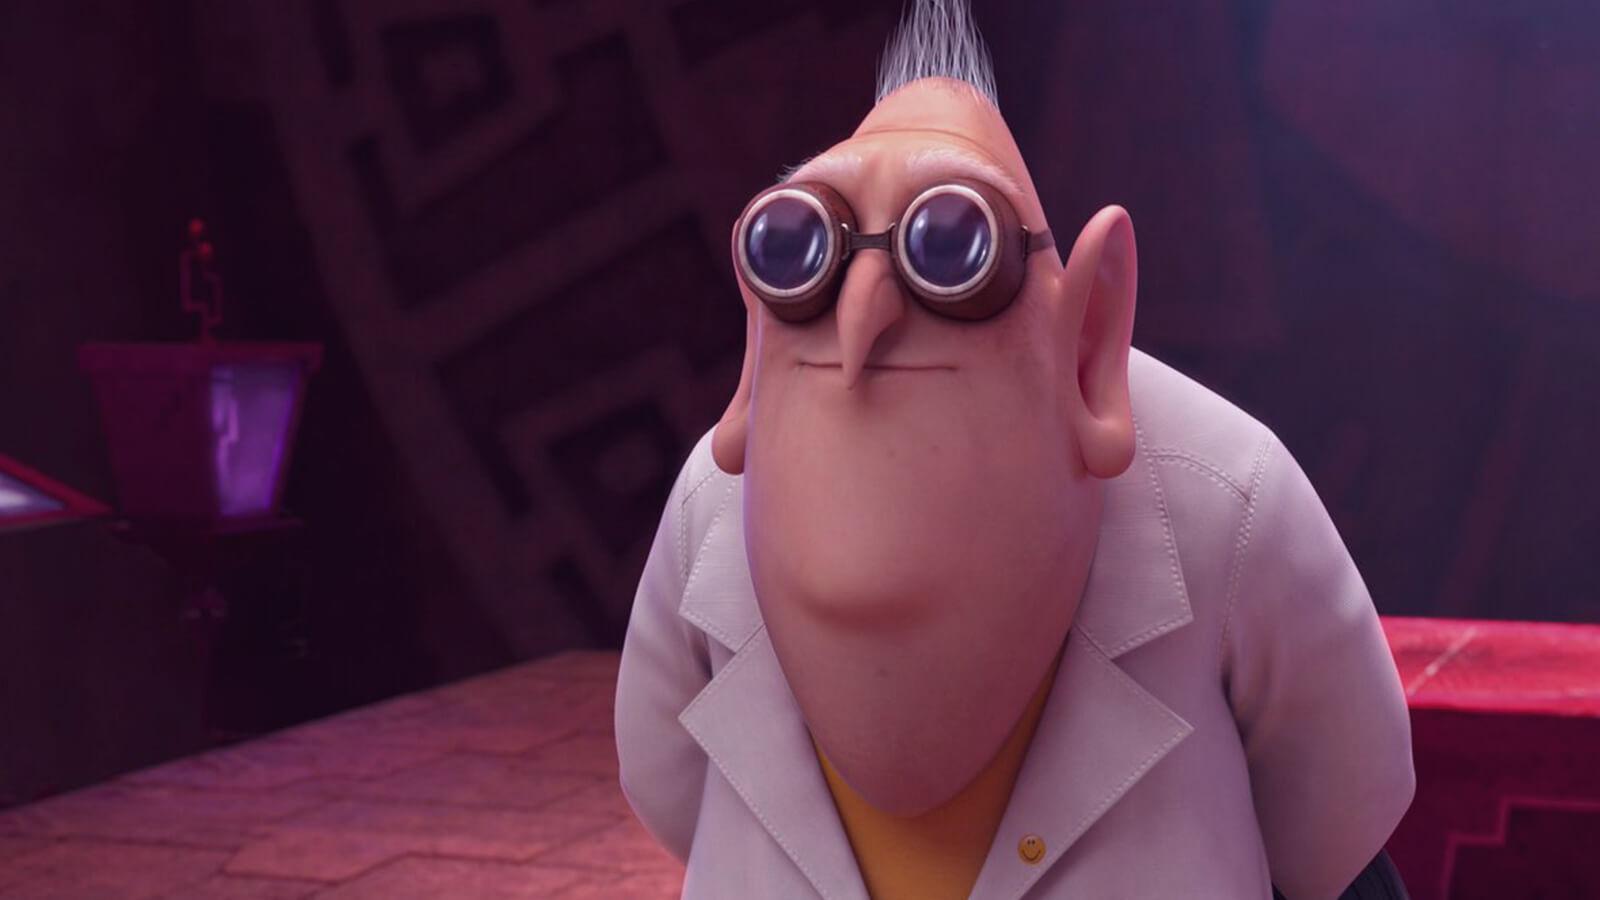 Professor Farnsworth from Futurama cartoon characters with glasses